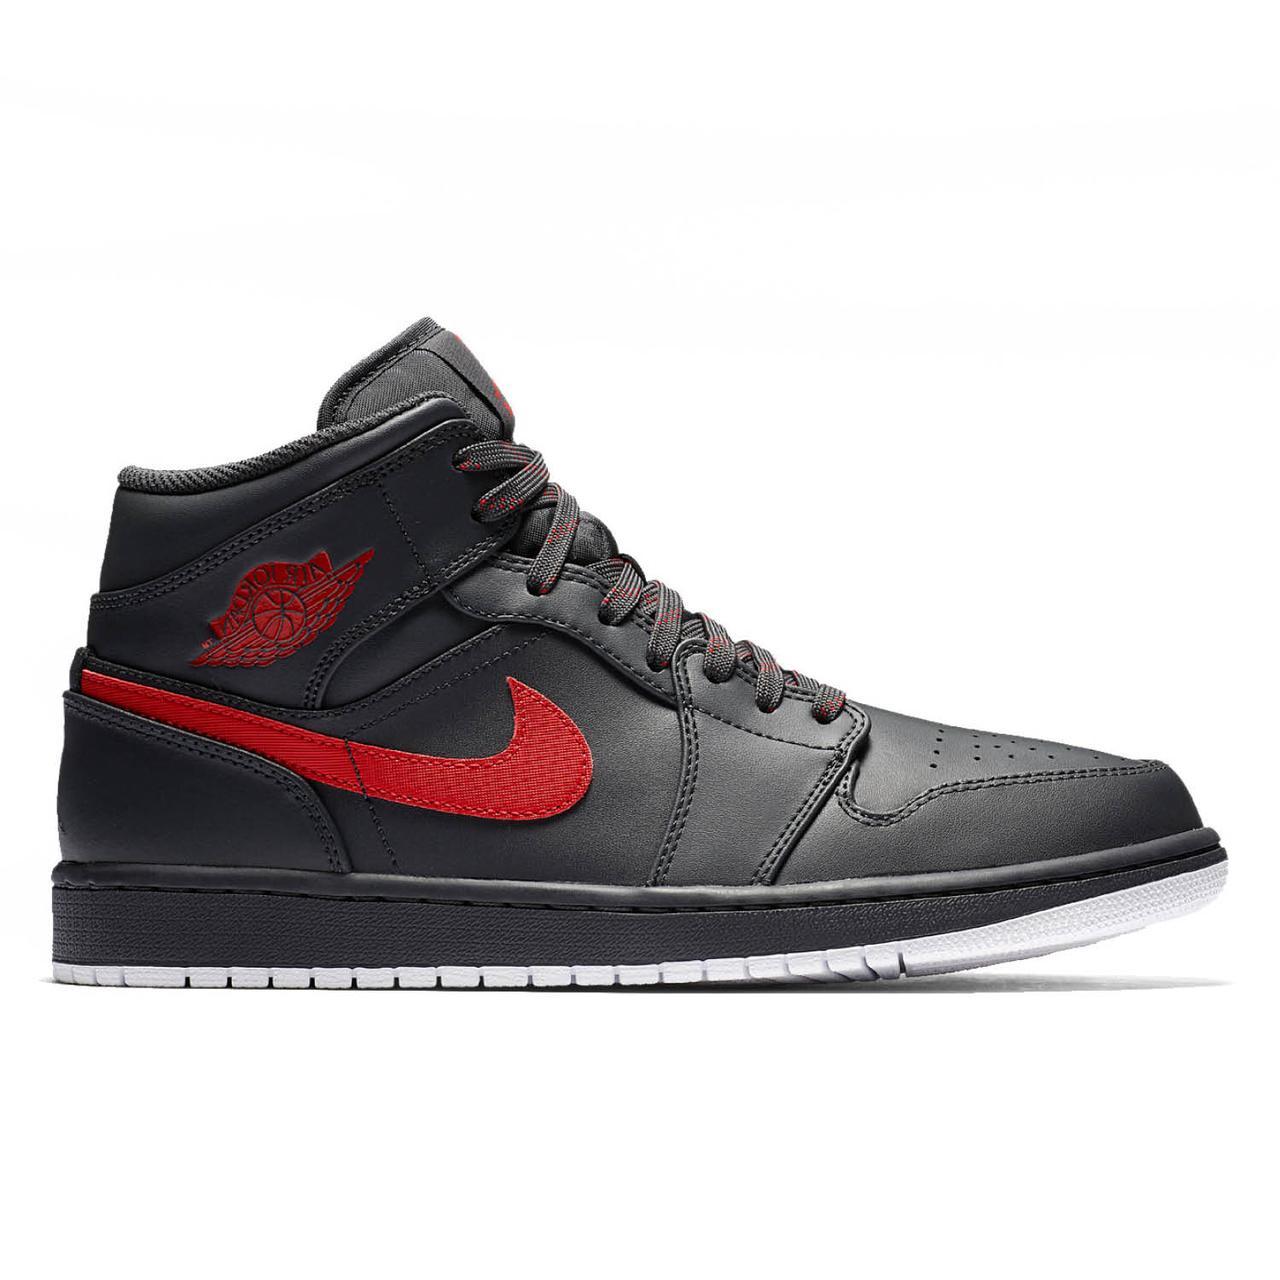 62147b82 Оригинальные Кроссовки Nike Air Jordan 1 Mid Black / White / Red — в ...